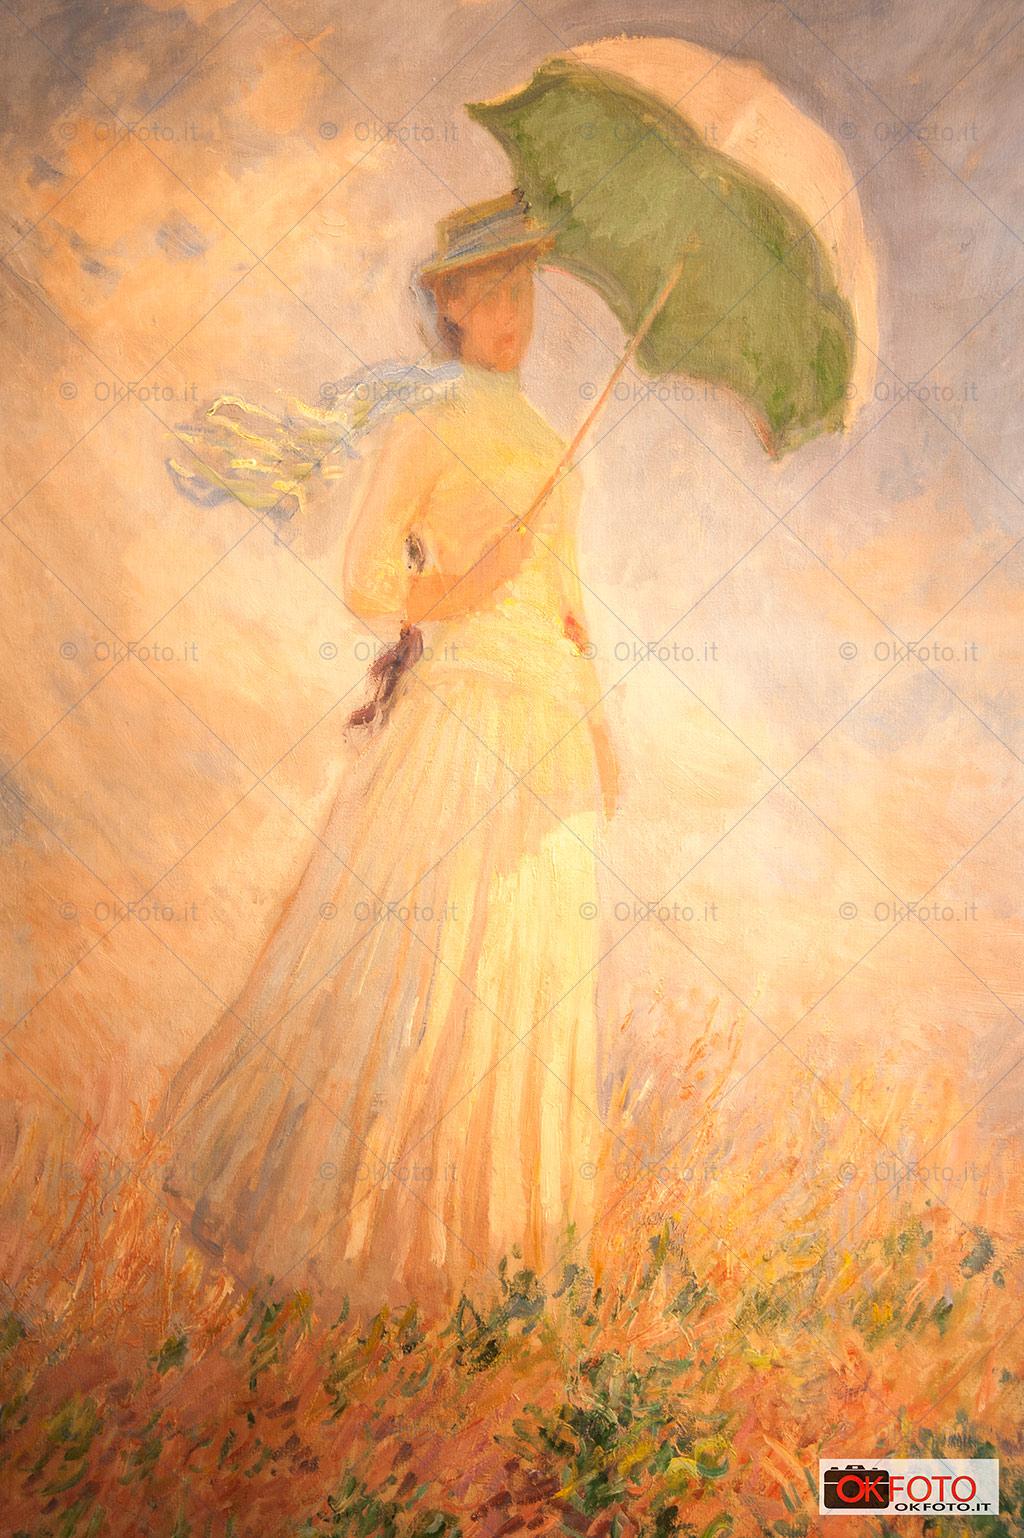 essai de figure en plein-air di Monet esposto alla GAM